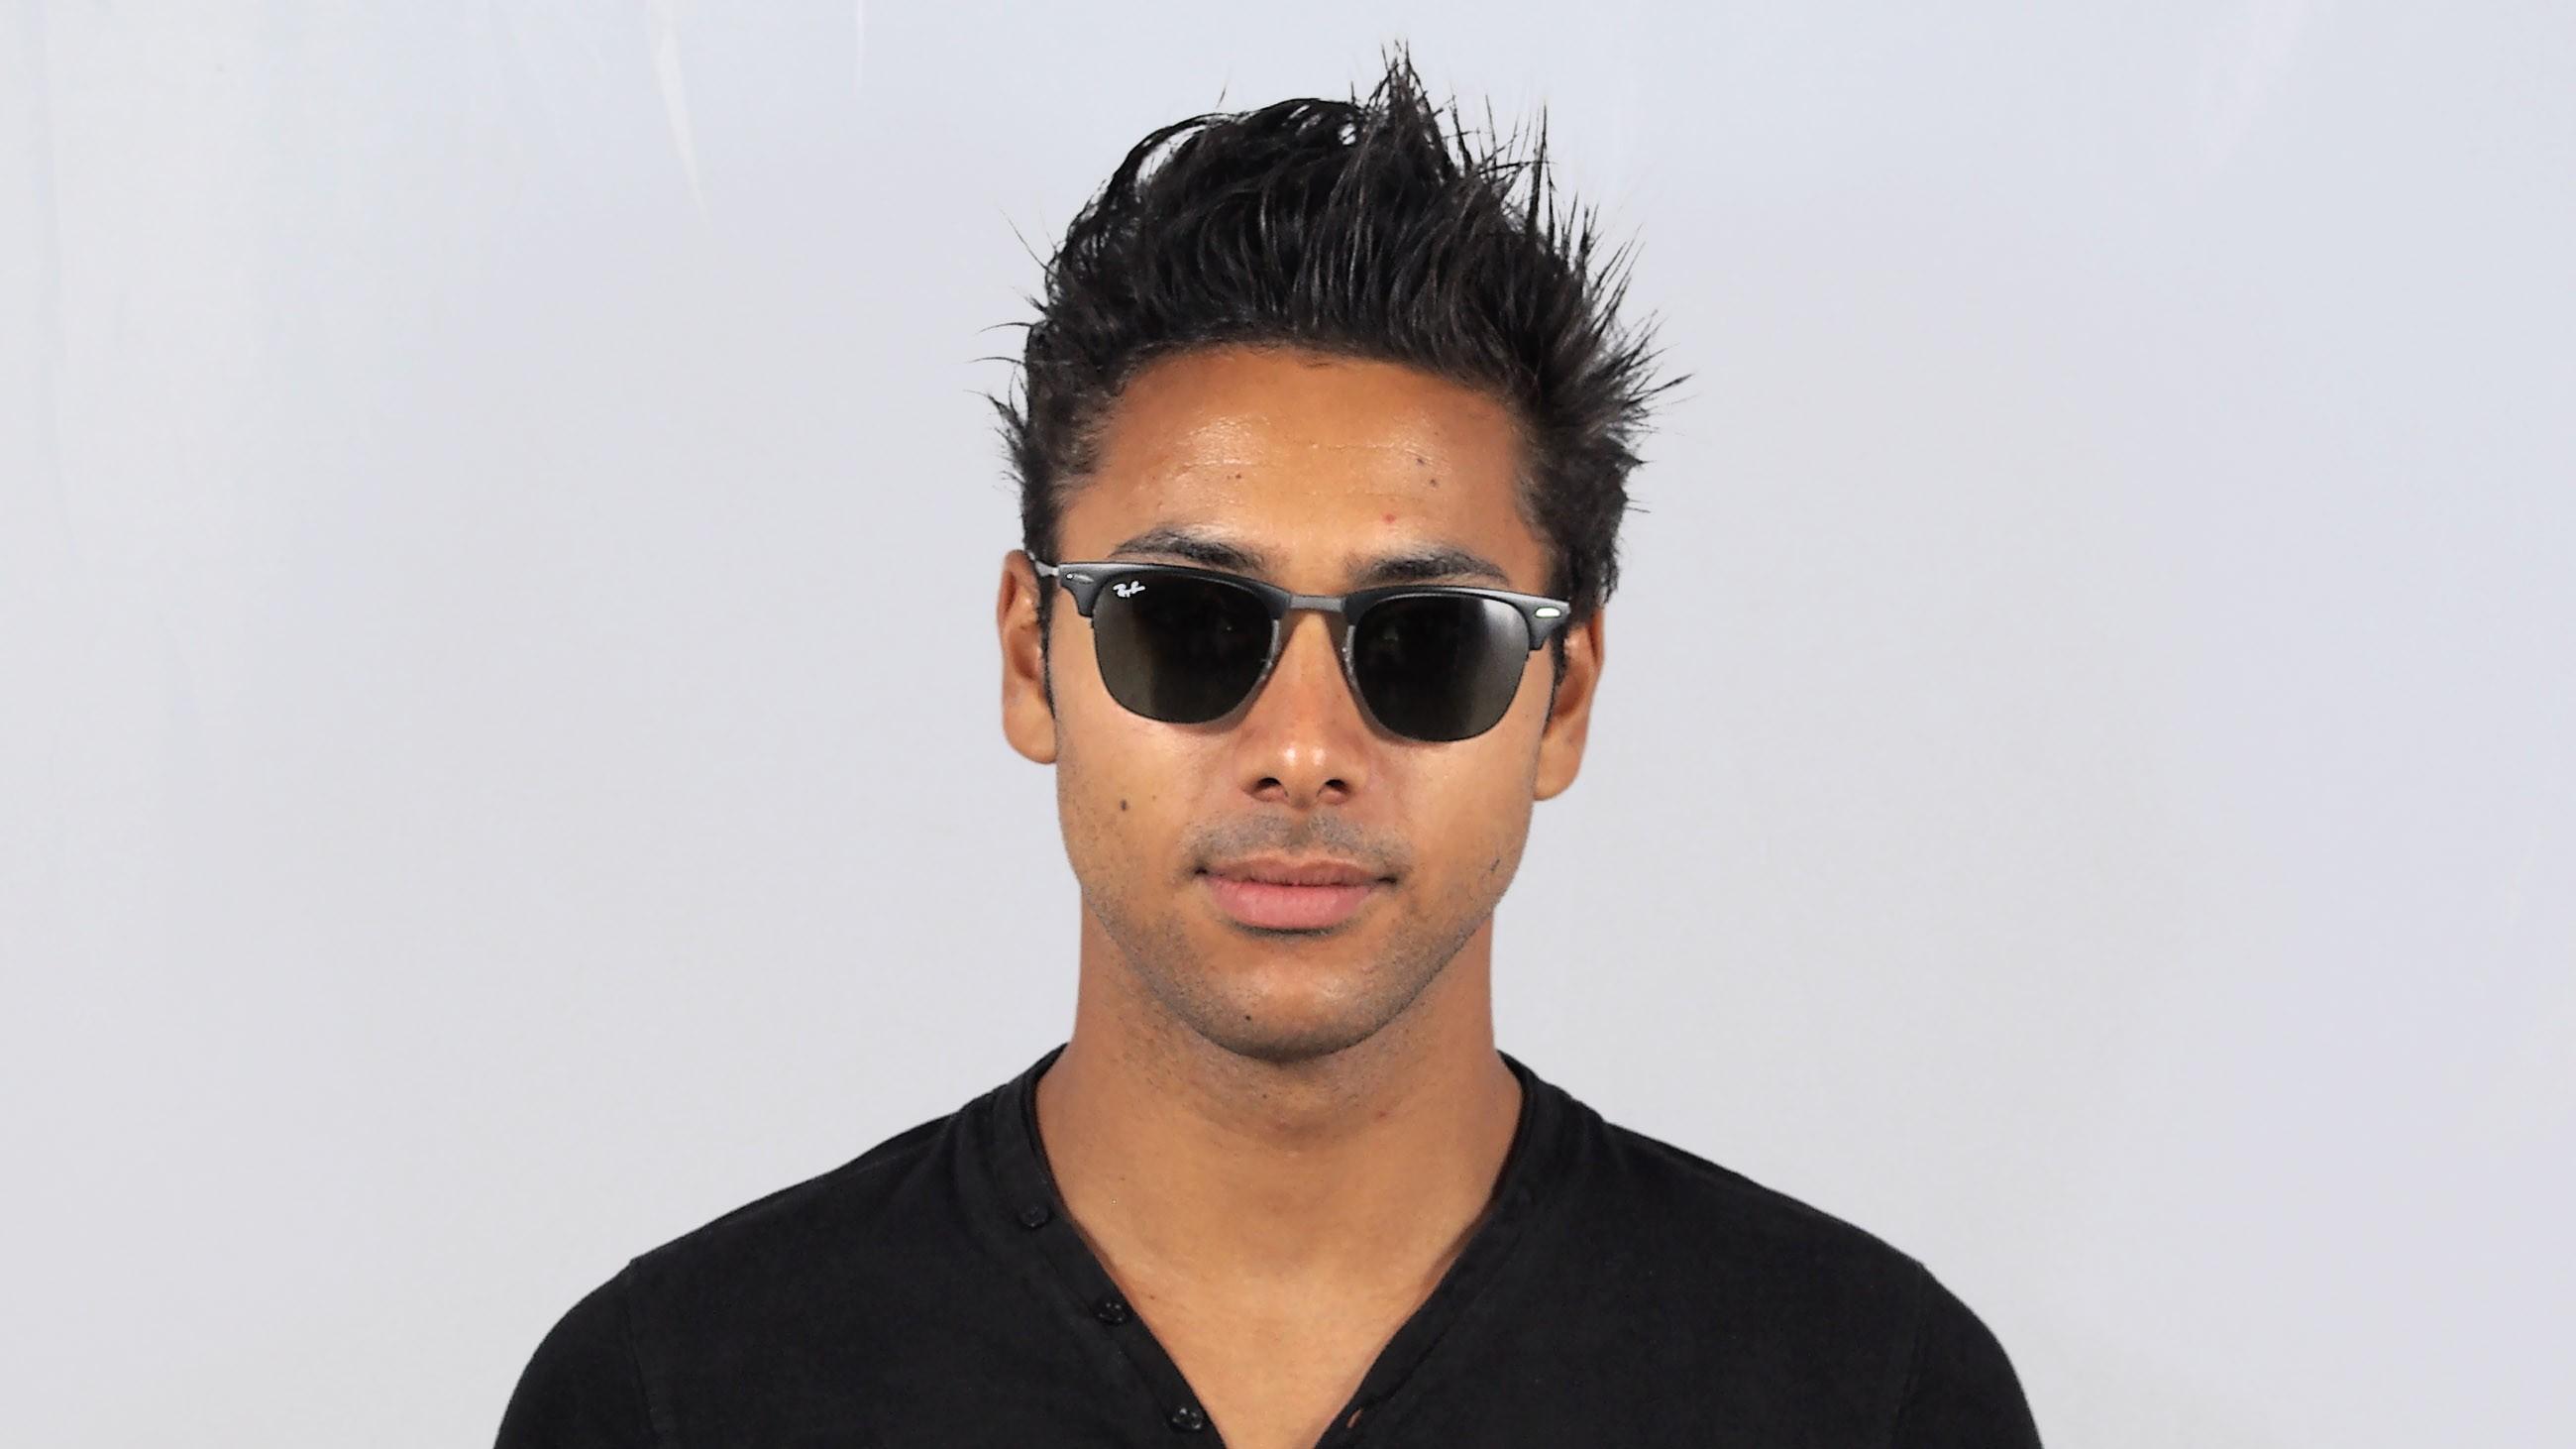 16f0d640ed Sunglasses Ray-Ban Clubmaster Light Ray Black RB8056 154 71 51-22 Medium